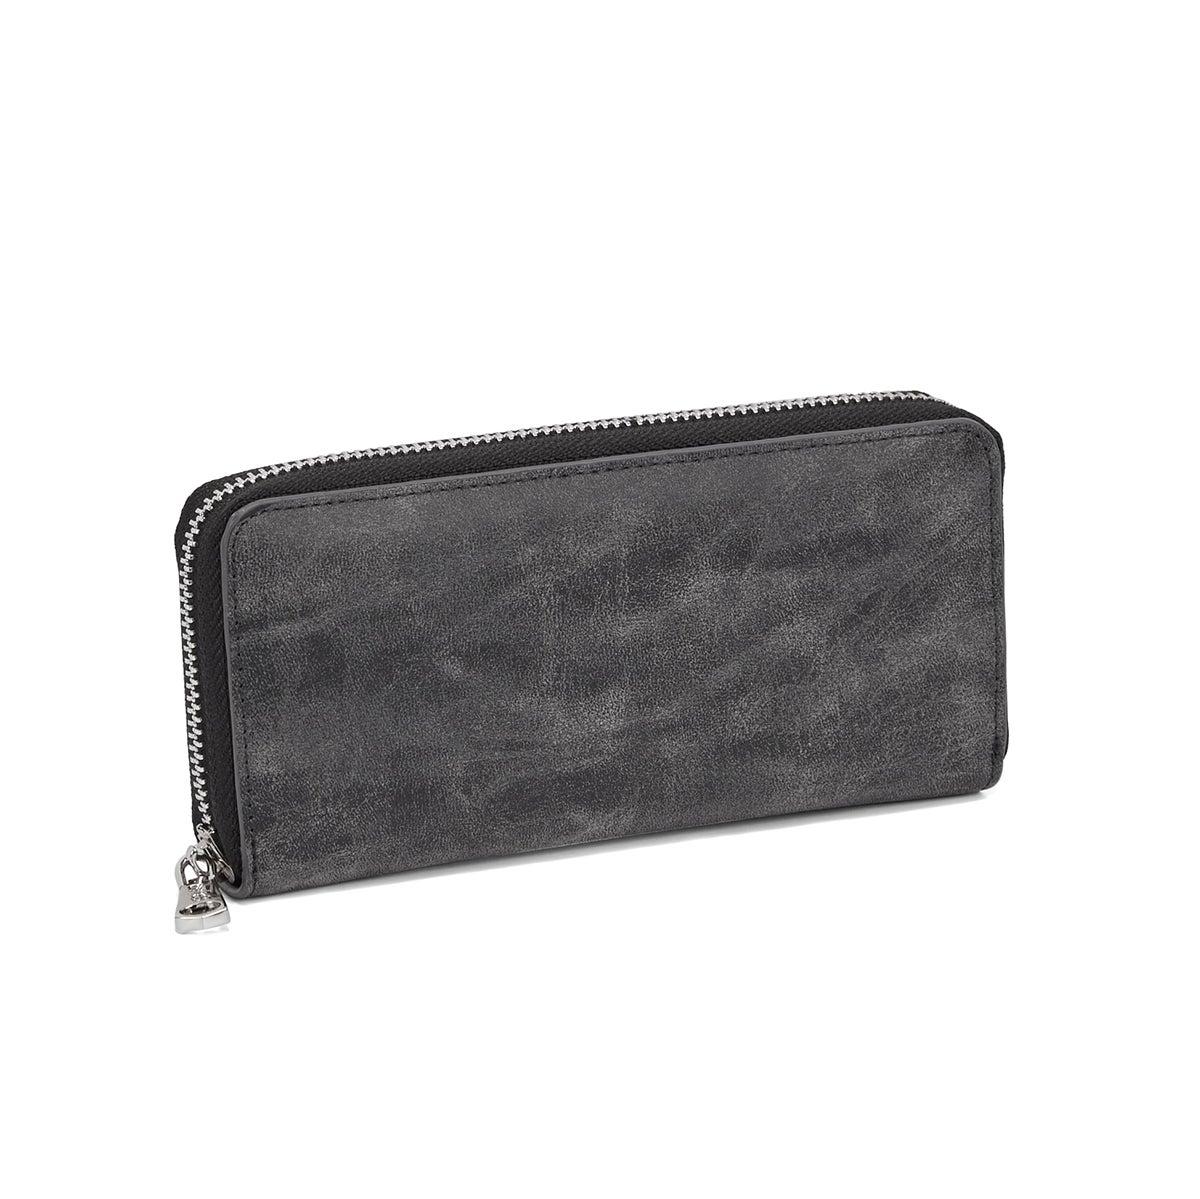 Lds dk grey zip around 4 card wallet